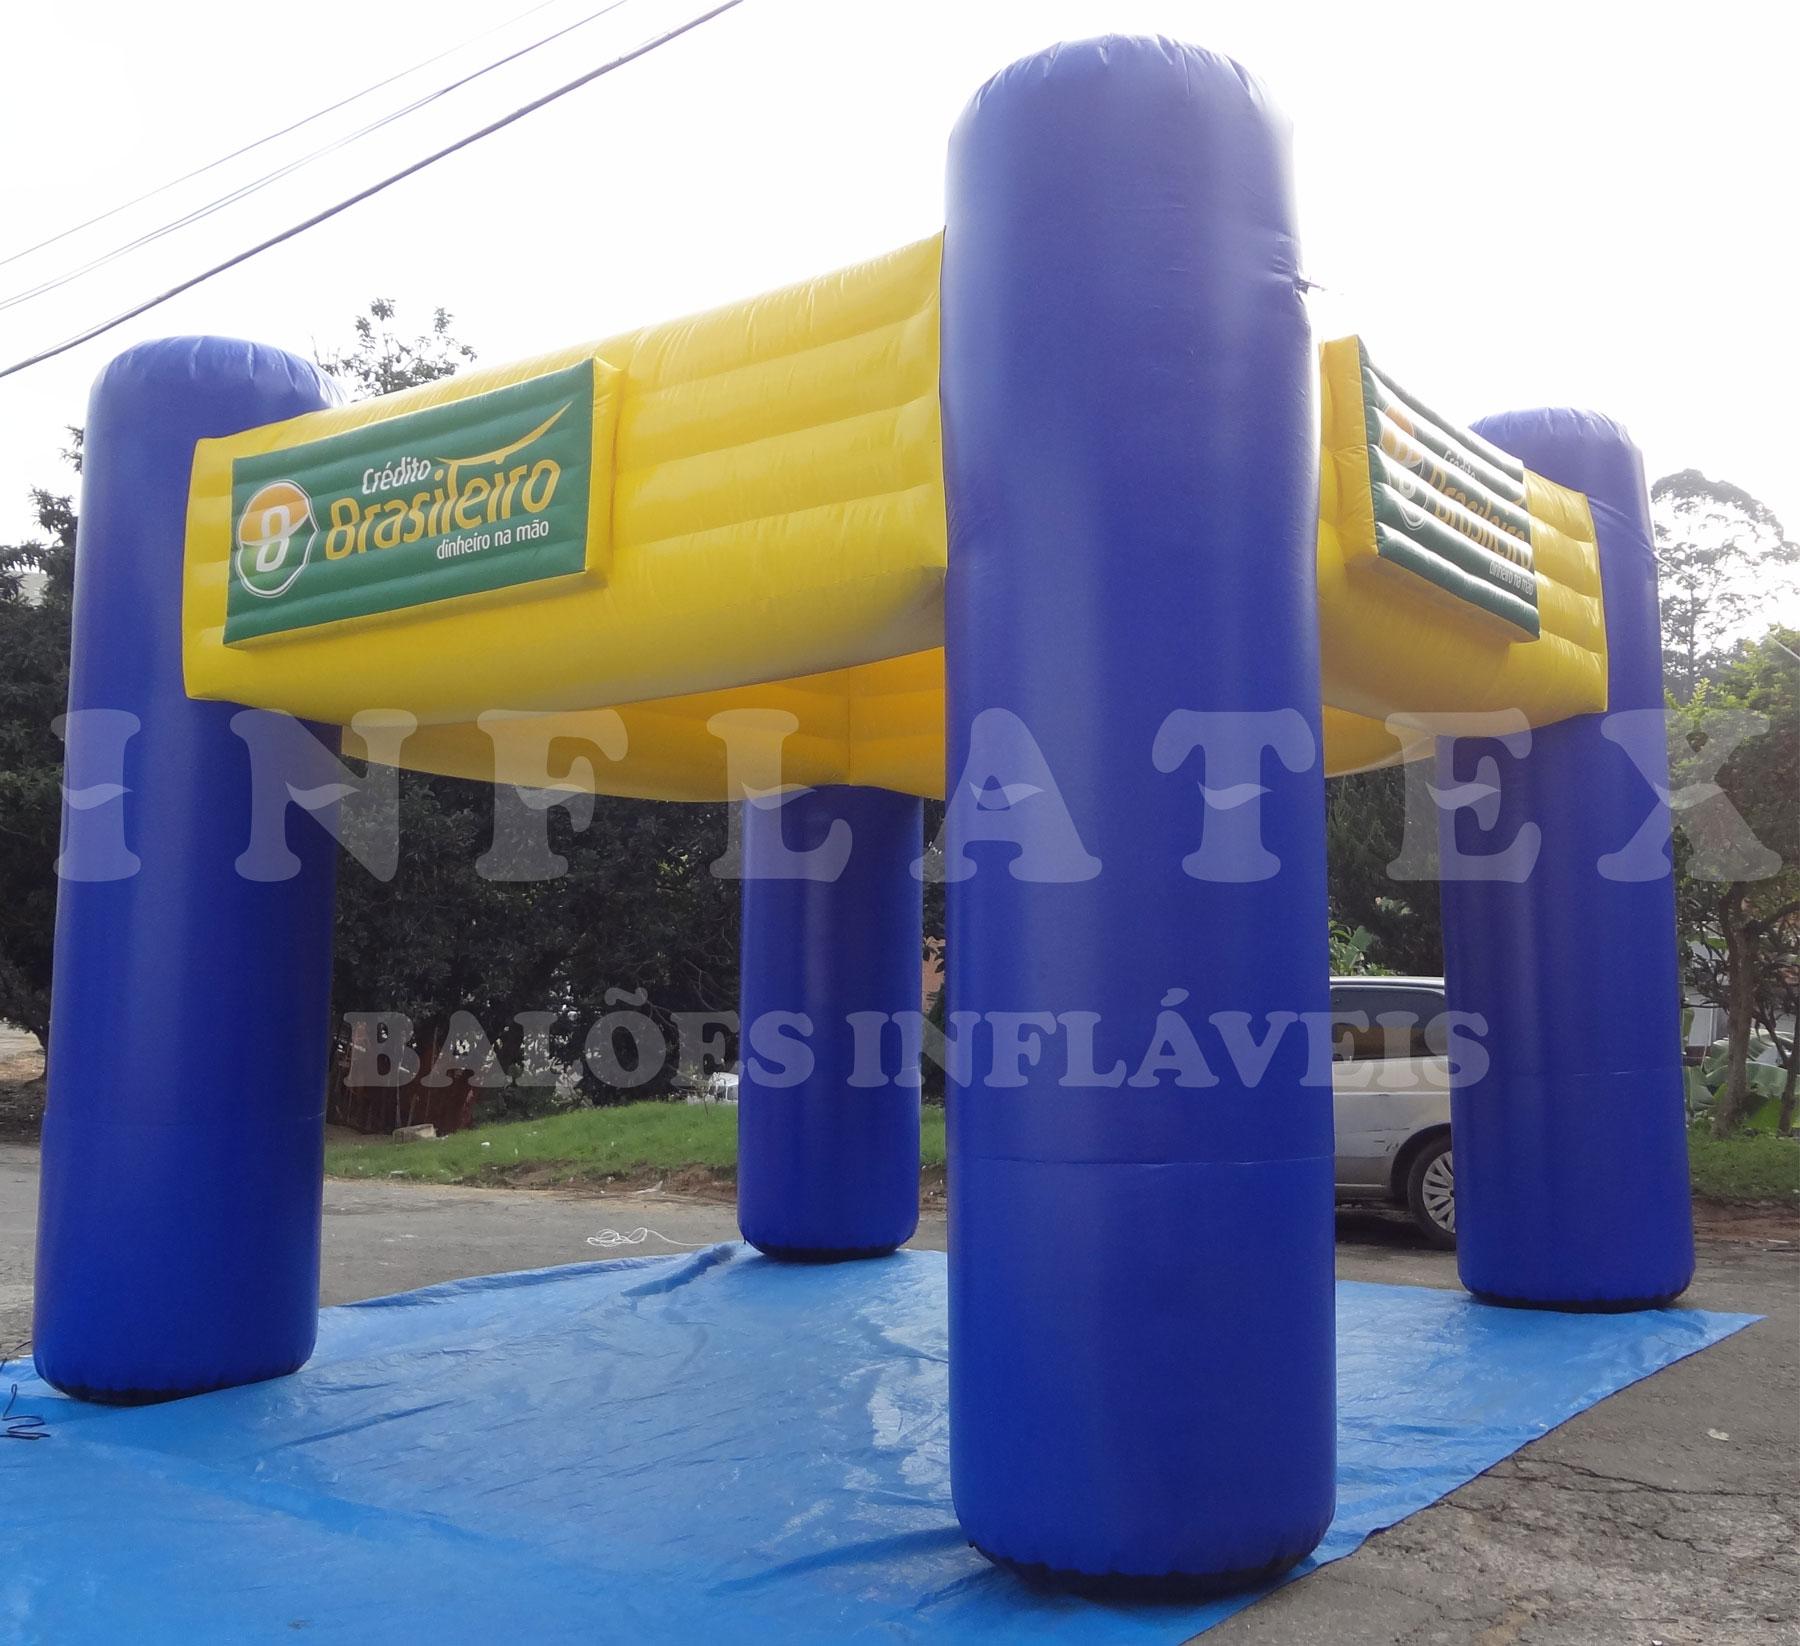 Tenda Inflável Credito Brasileiro